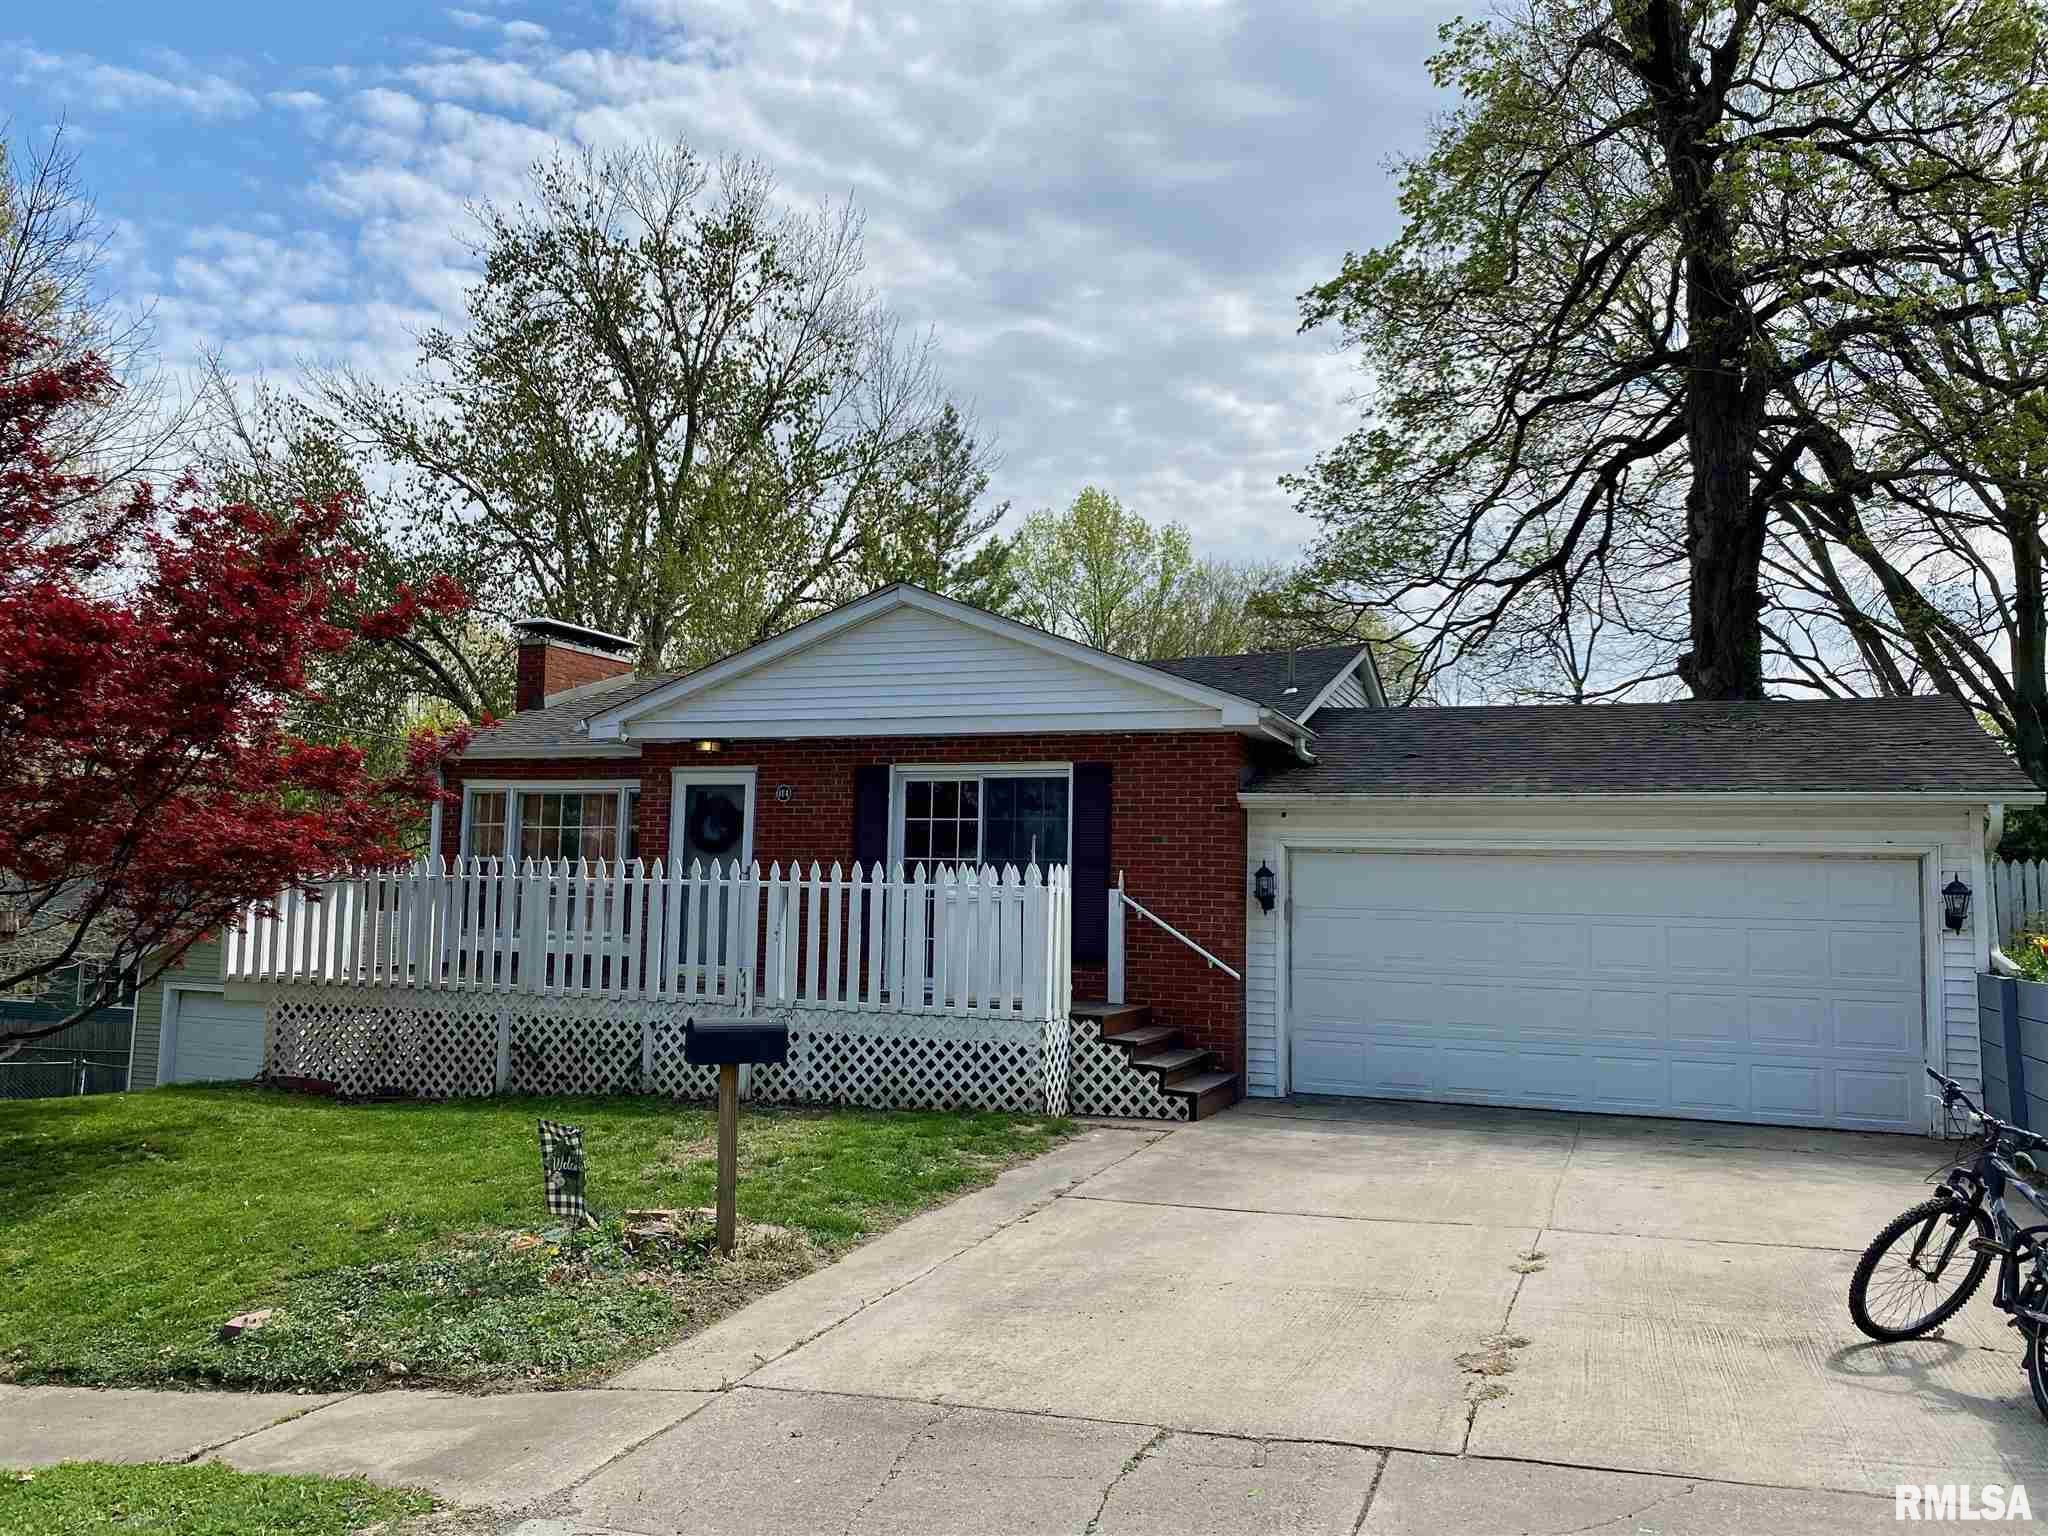 114 W JEFFERSON Property Photo - Petersburg, IL real estate listing